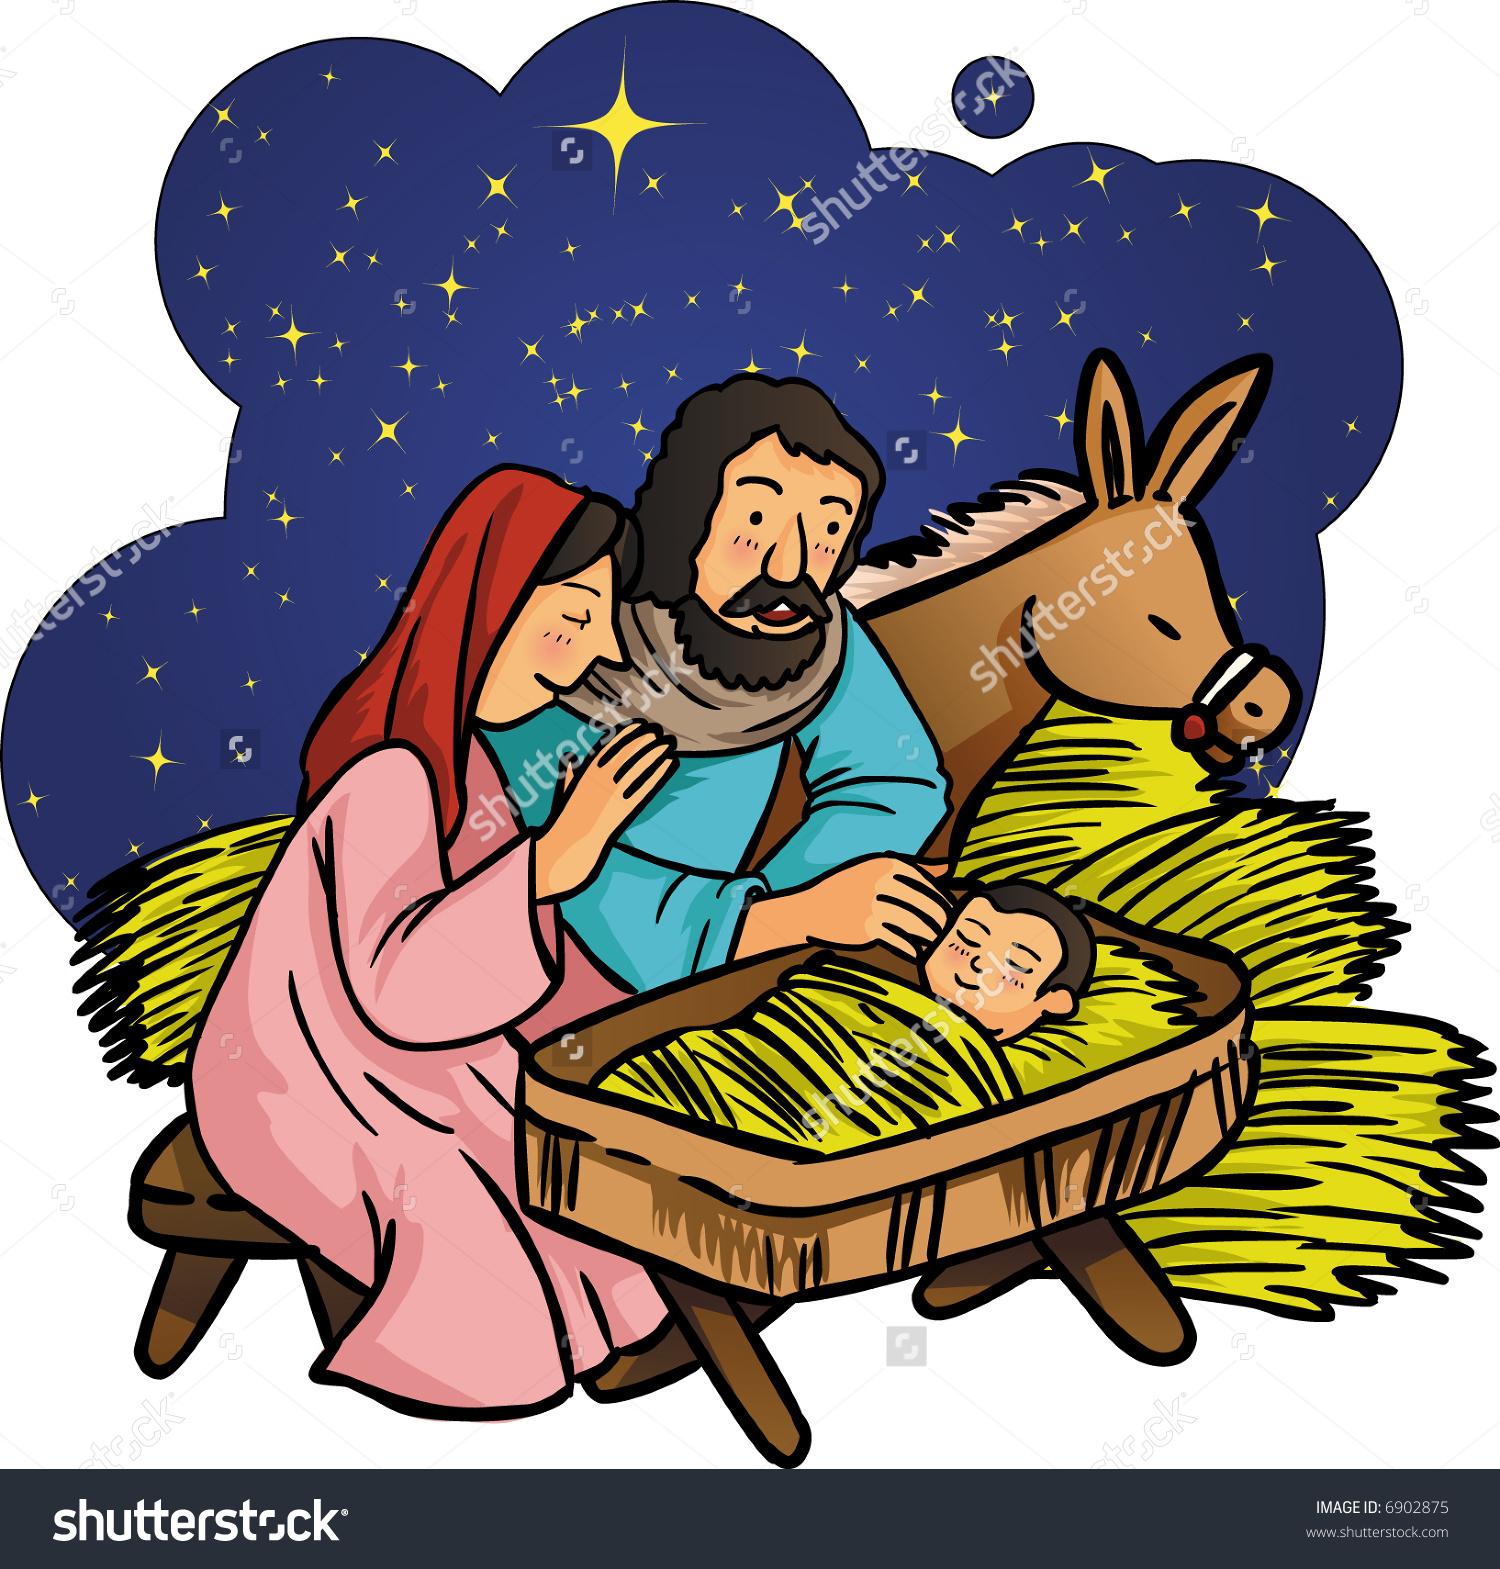 Jesus born clipart 2 » Clipart Station.